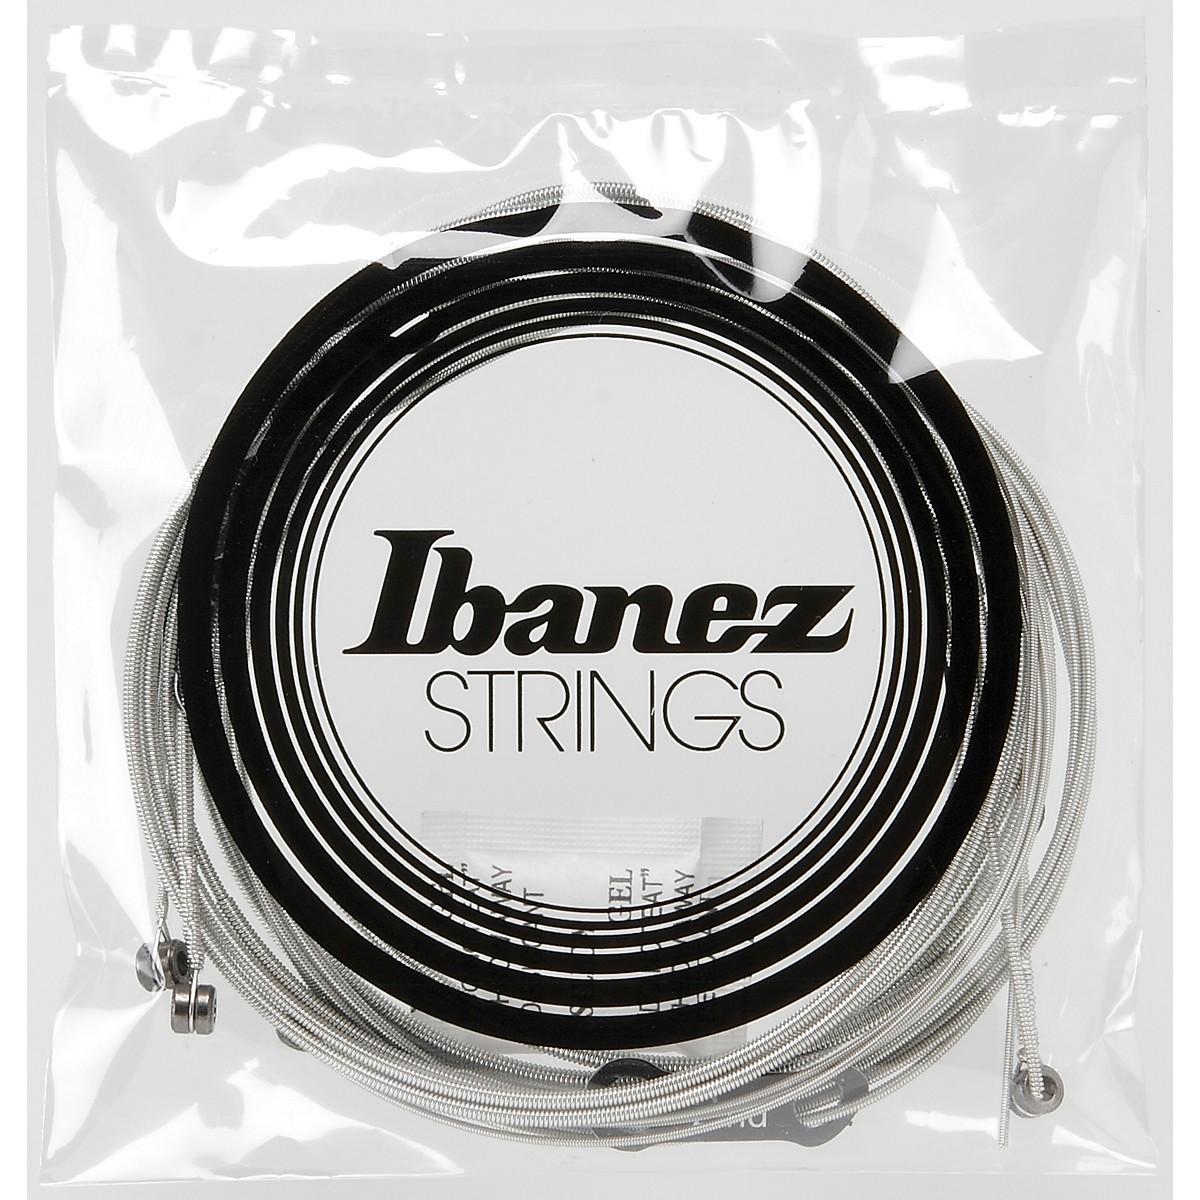 IBANEZ IEBS4C - MUTA BASSO ELETTRICO 4 CORDE 045-105